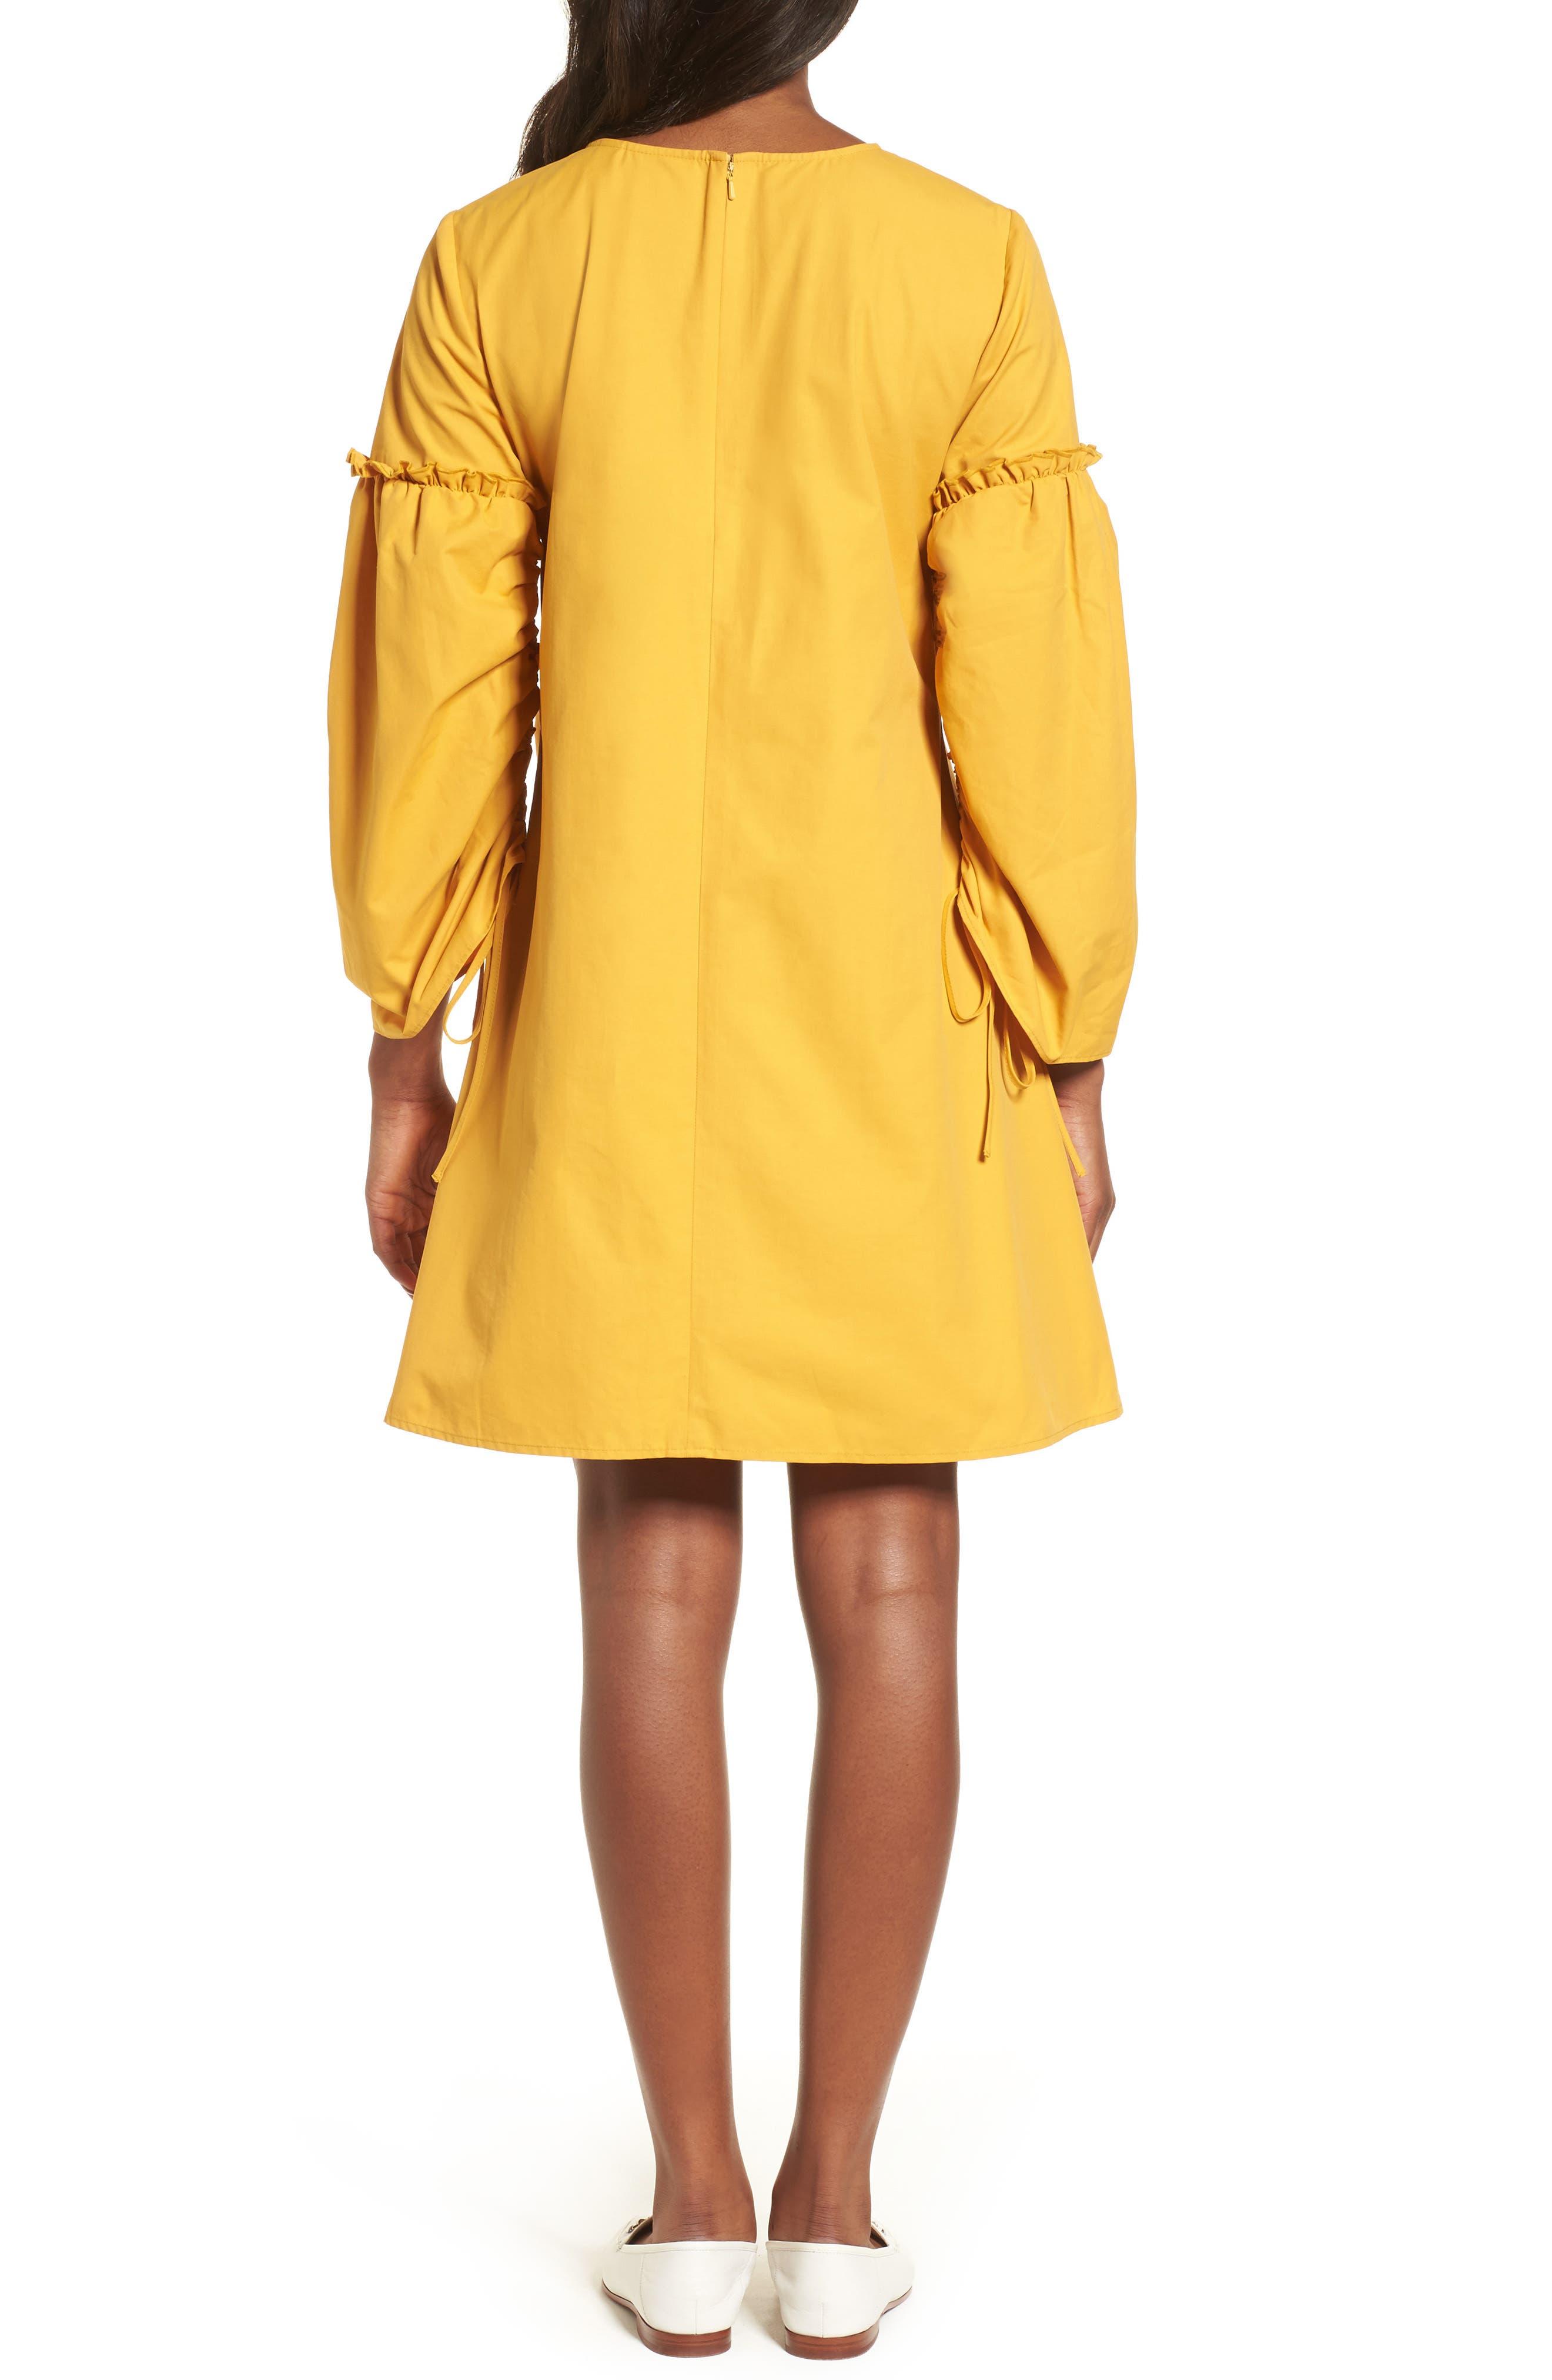 Parachute Sleeve Shift Dress,                             Alternate thumbnail 2, color,                             Yellow Mineral